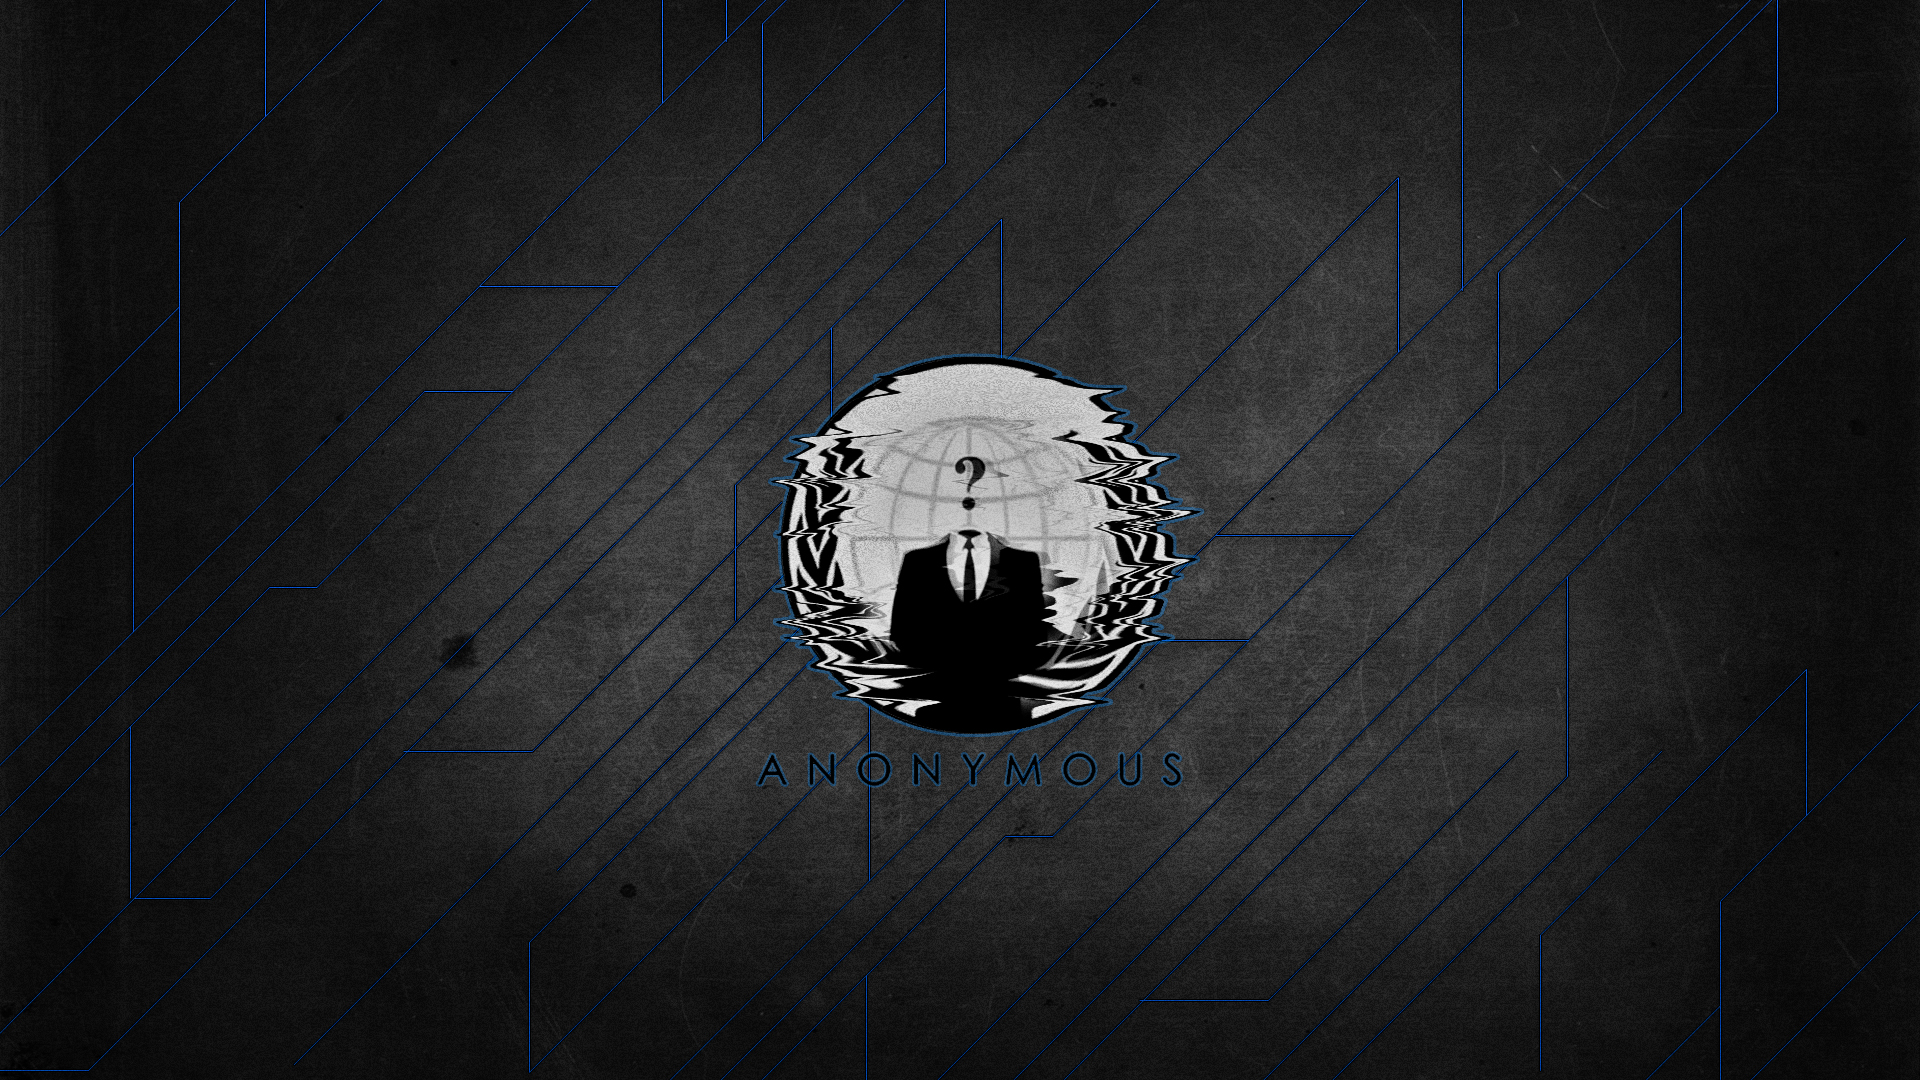 Anonymous HD Wallpaper 1920x1080 - WallpaperSafari